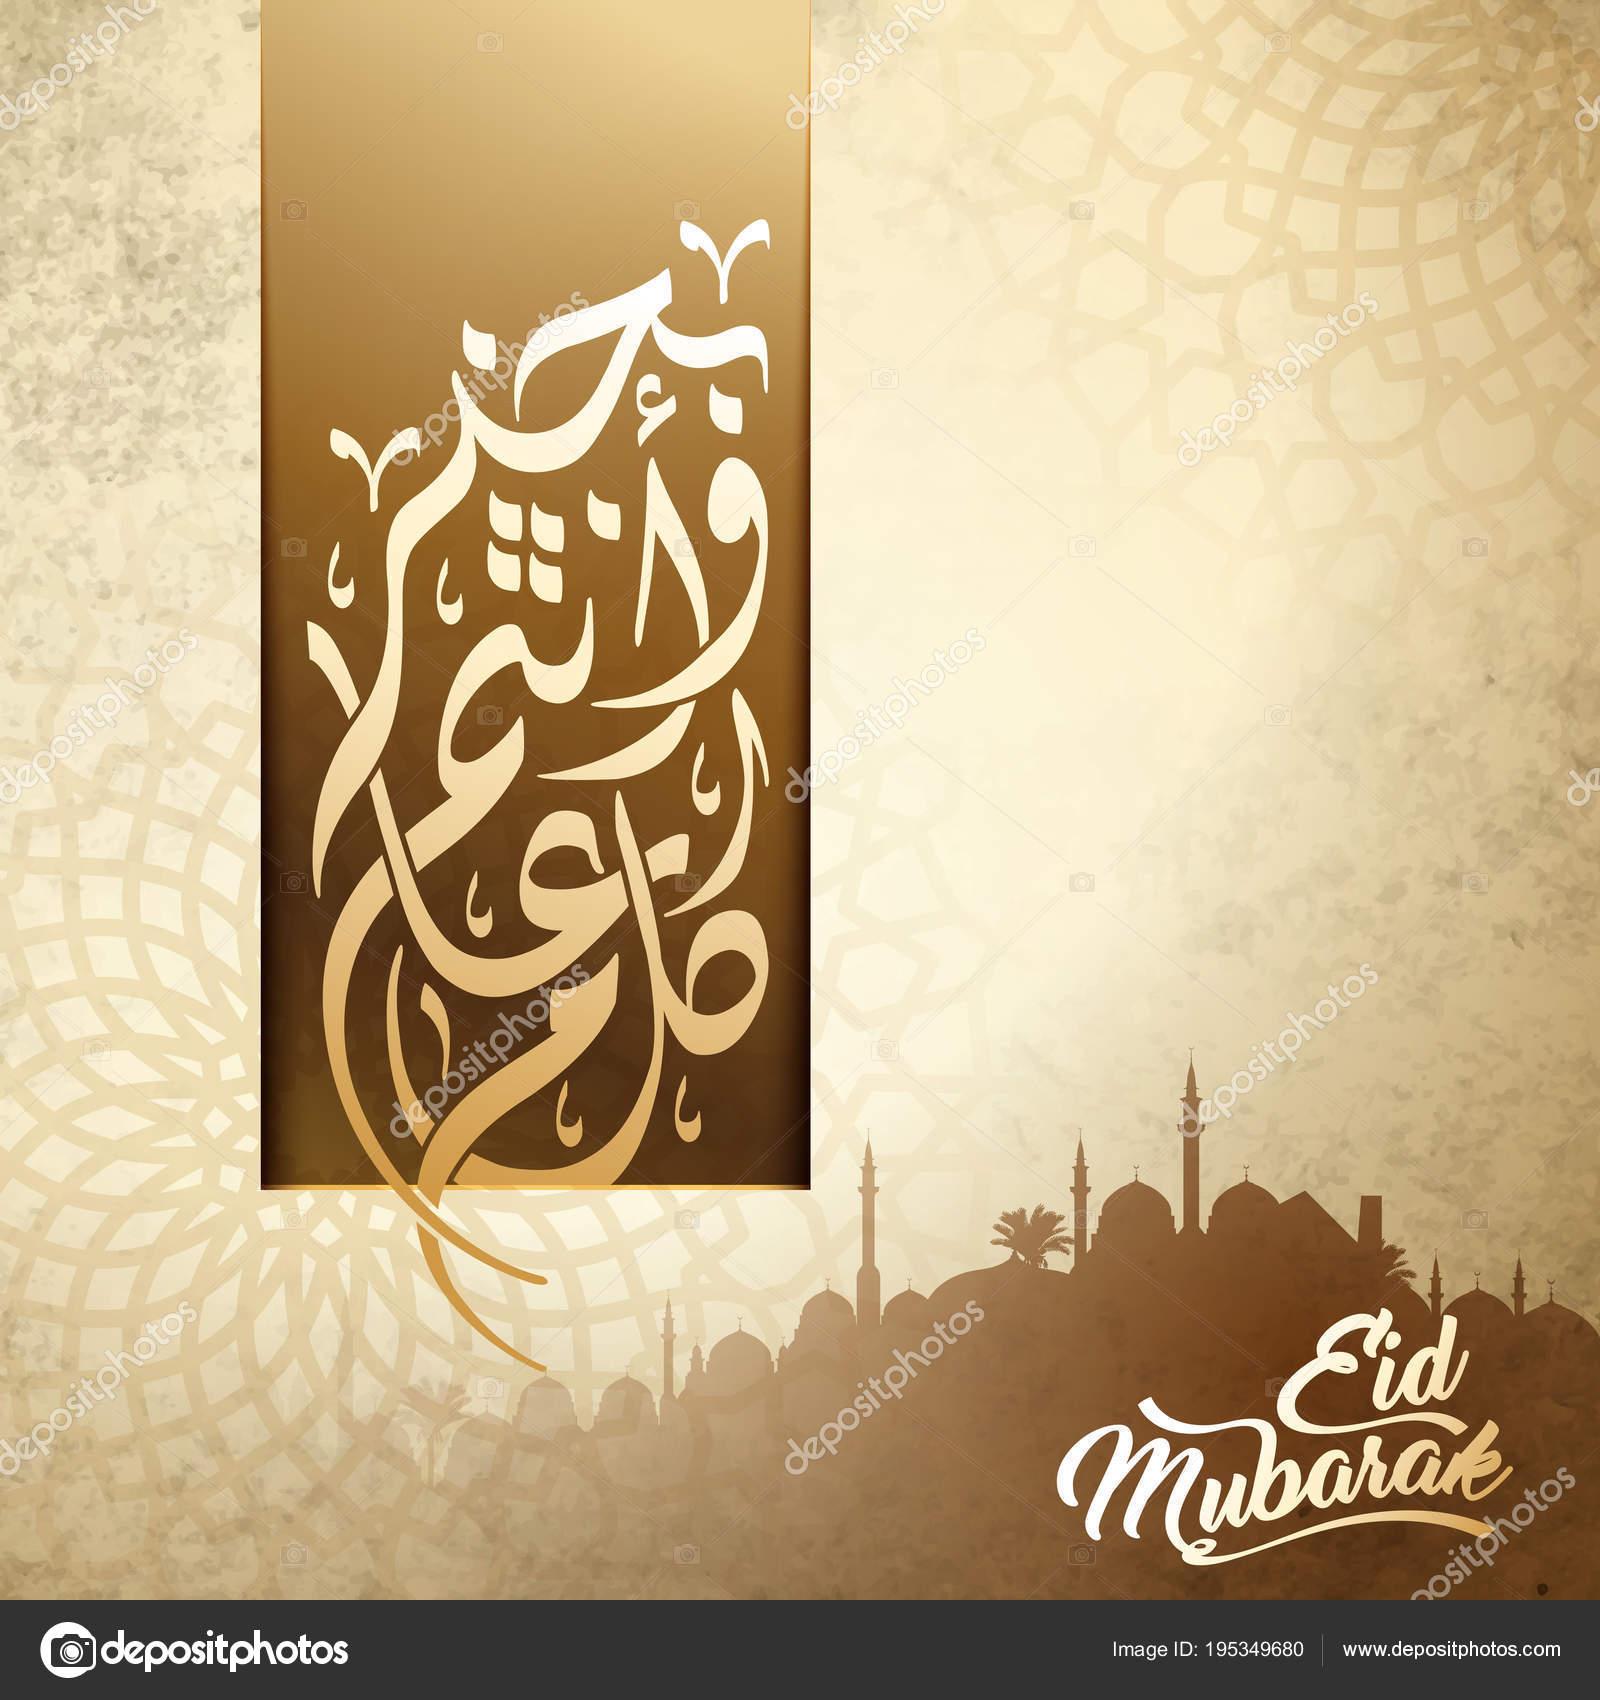 Happy Eid Mubarak Arabic Calligraphy Islamic New Hijri Year Greeting